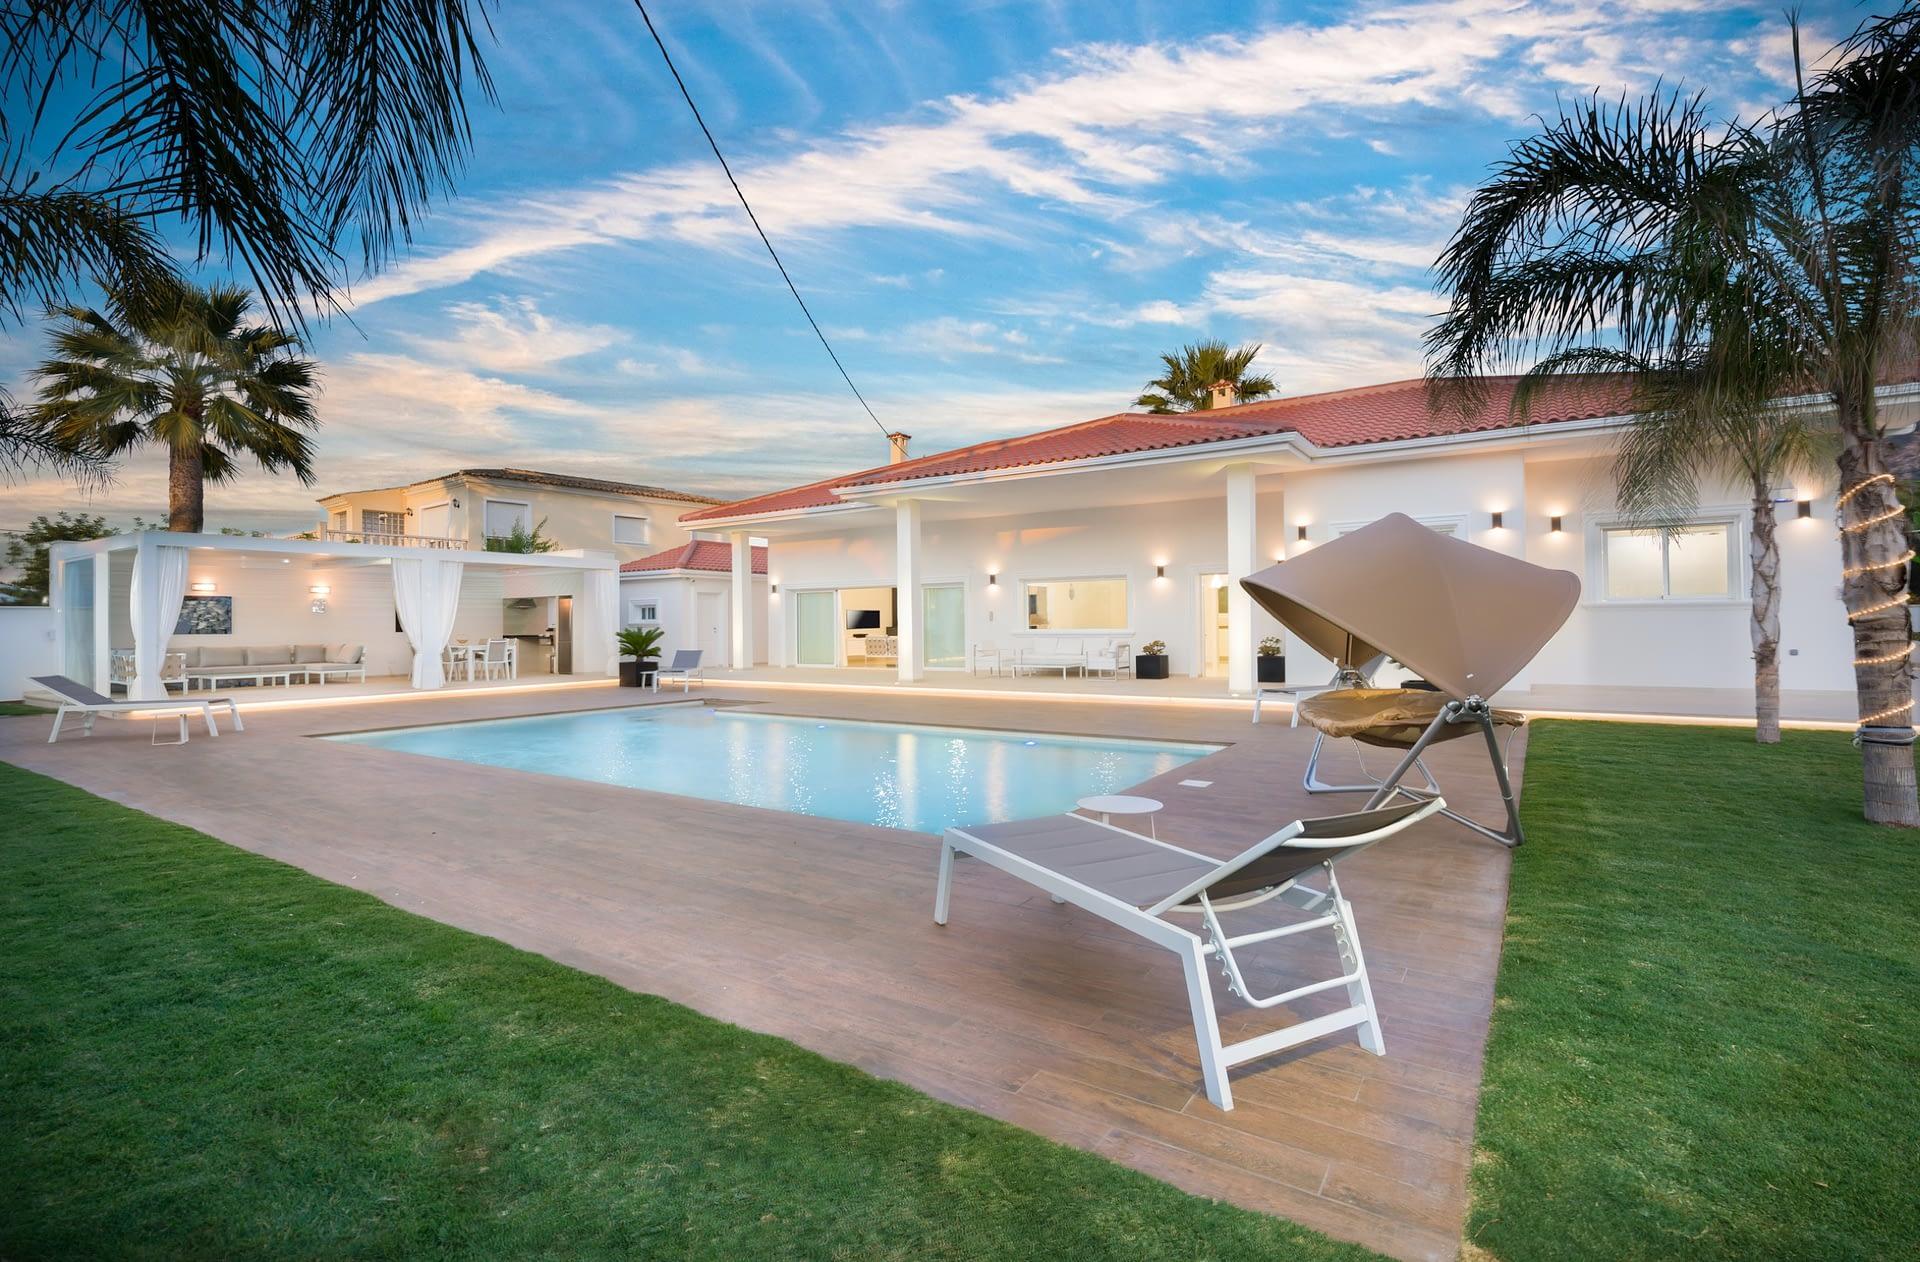 Pierluigi Cavarra - fotografo de Inmobiliaria - real estate photography costa blanca - ejemplo 4